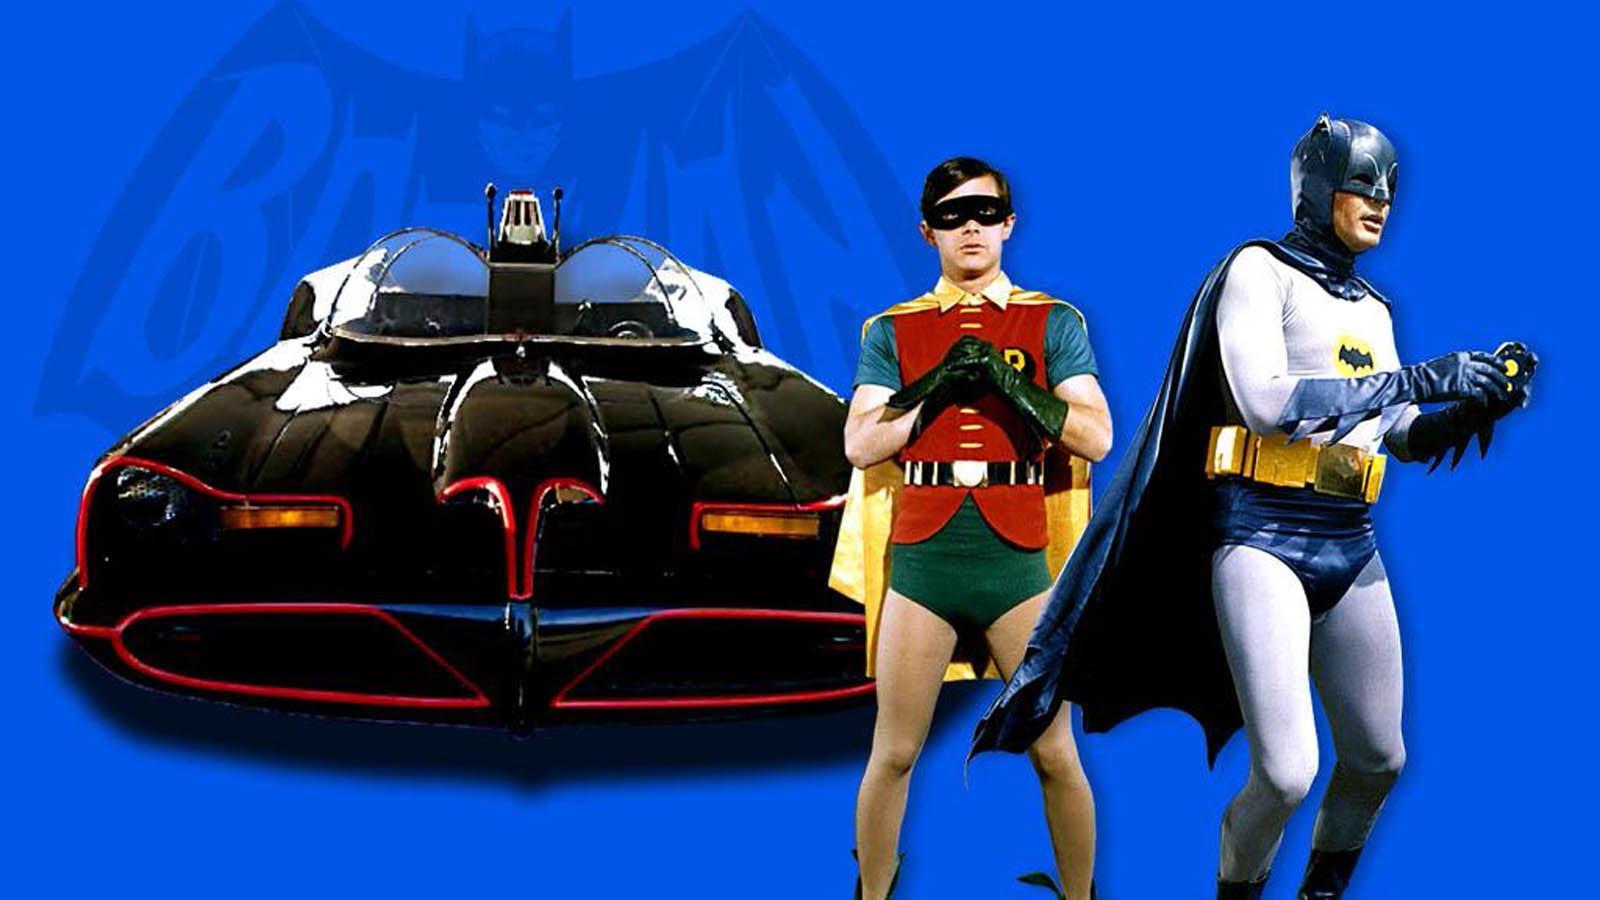 Batman 1966 movie posters 24x36